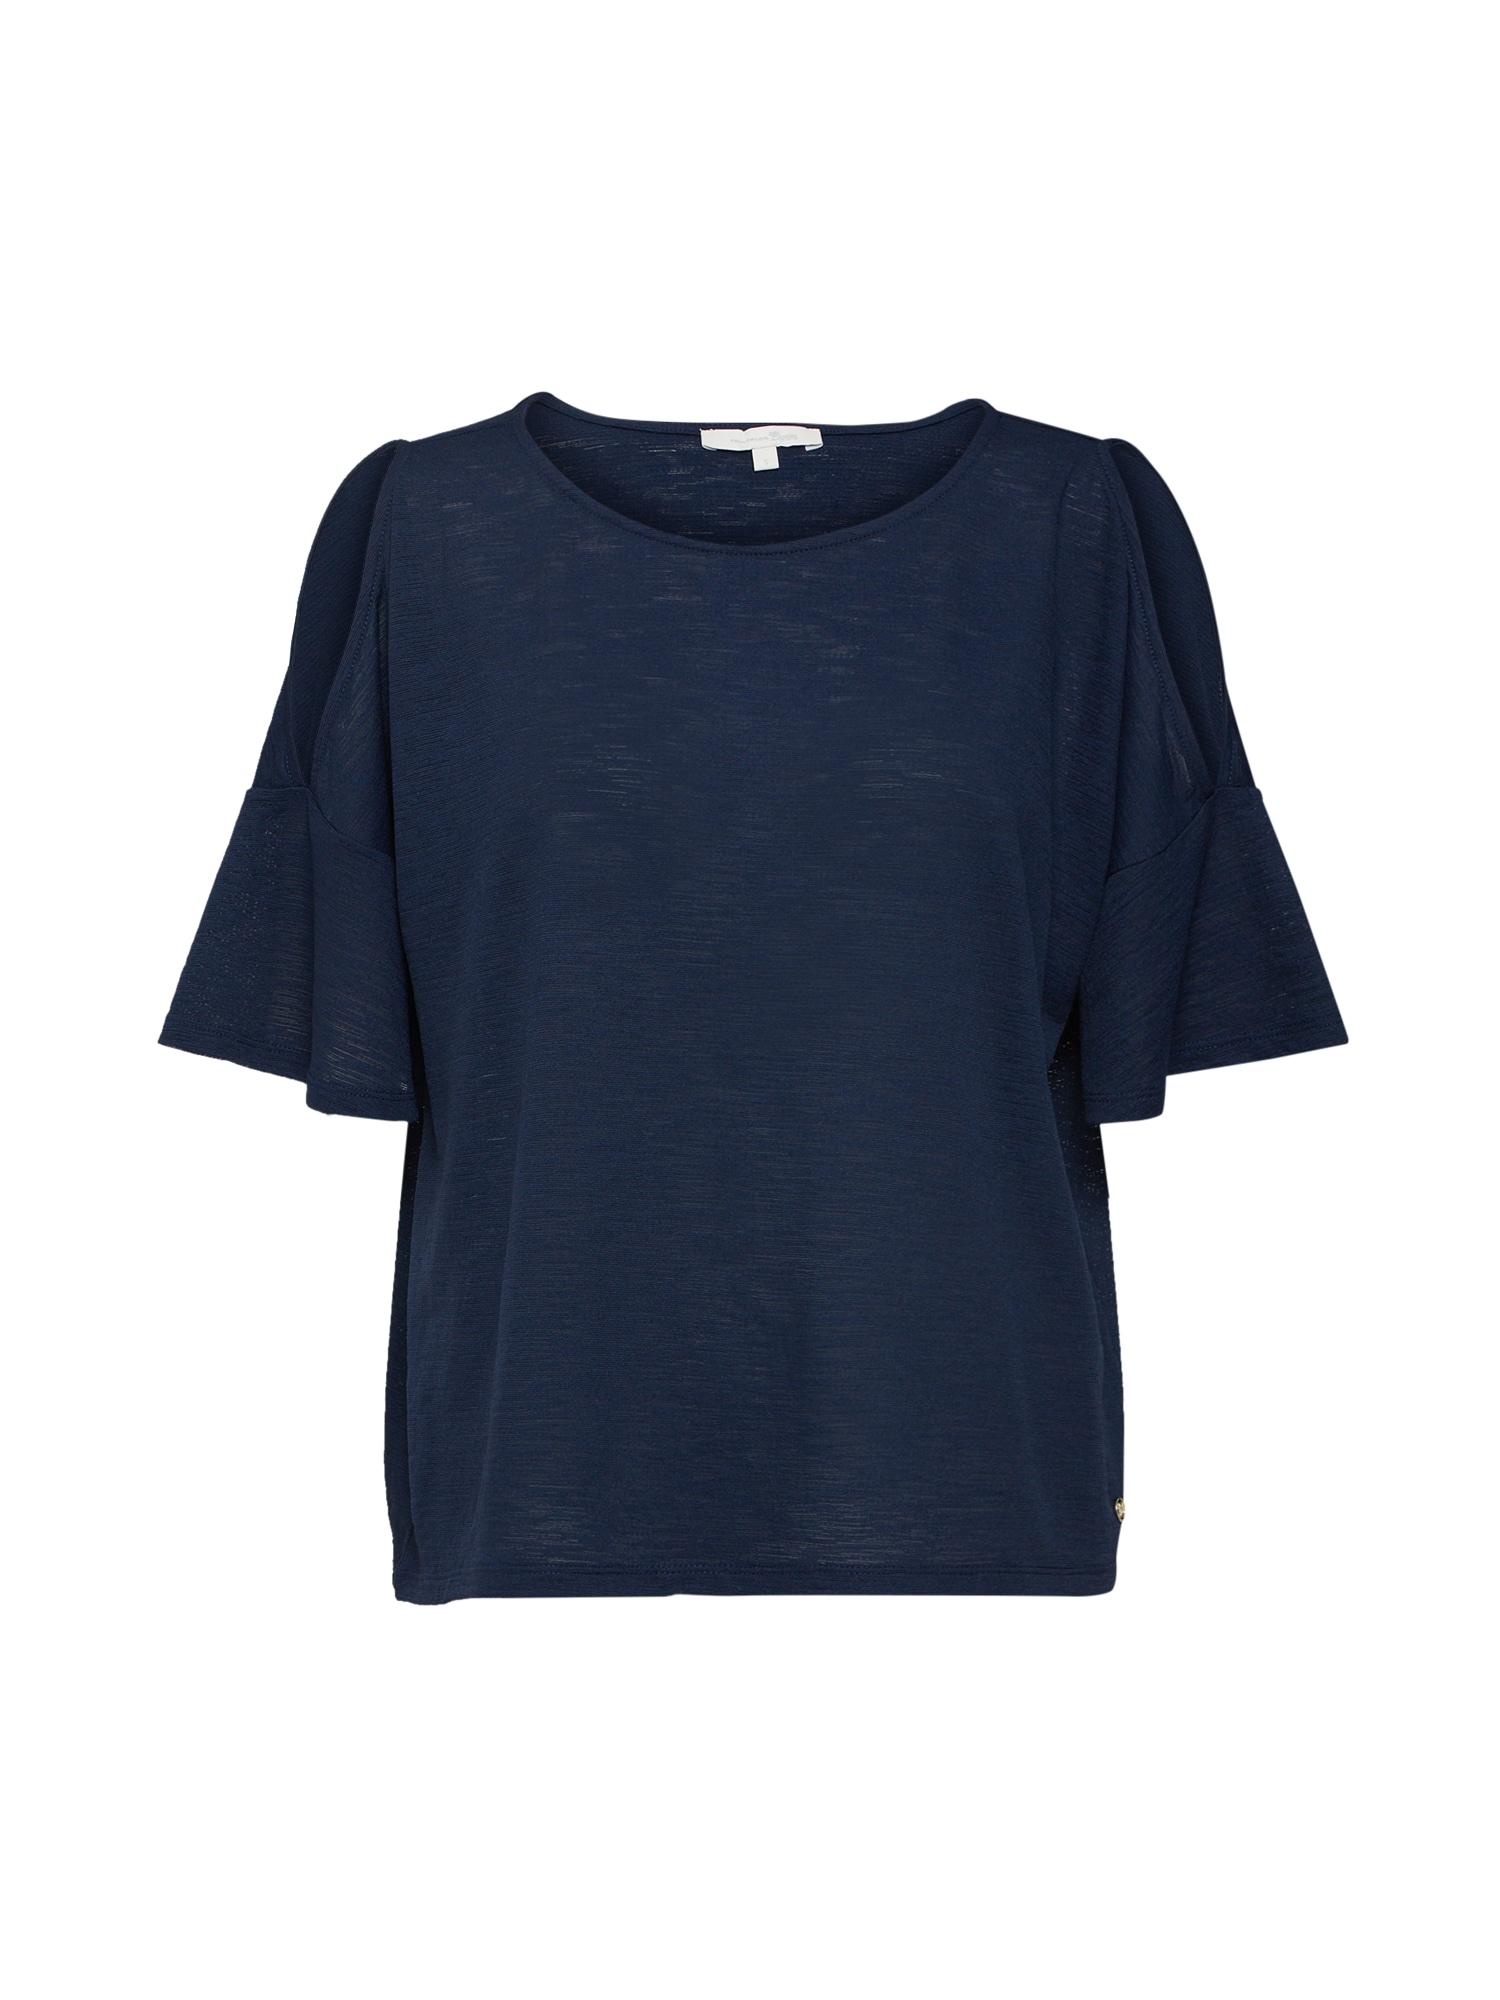 Tričko námořnická modř TOM TAILOR DENIM